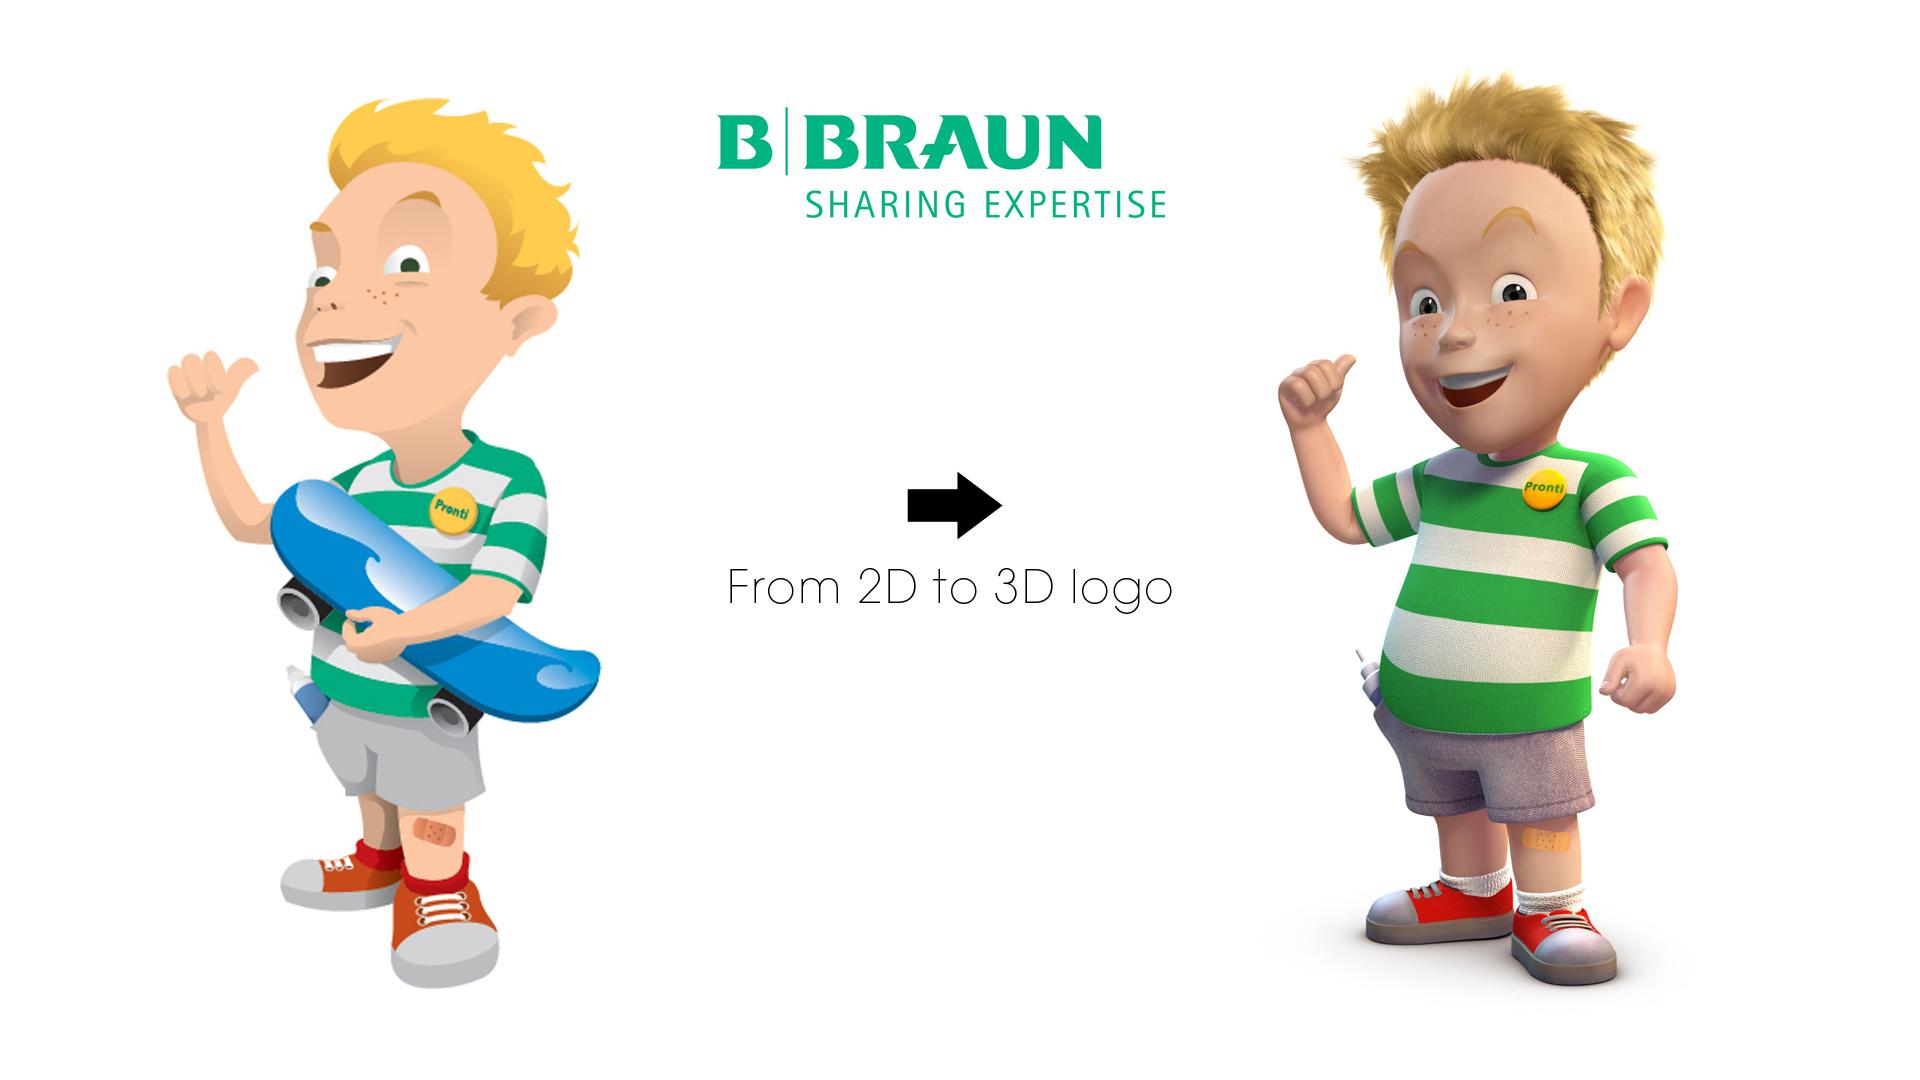 Bbraun transforming 2d to 3d logo cartoon character